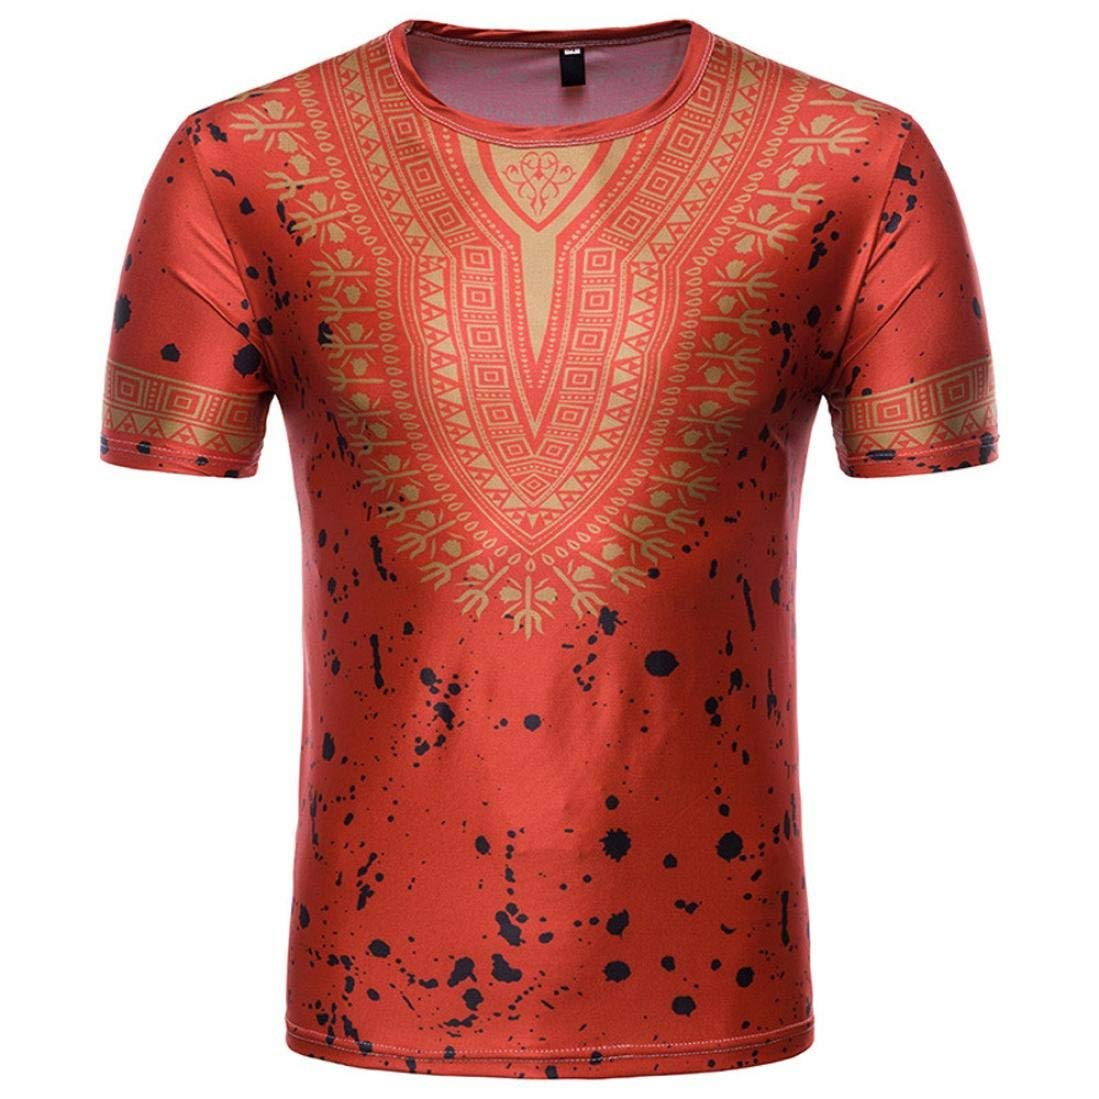 Coper New T-shirt, Men African Print O Neck Pullover T-shirt Short Sleeve Blouse